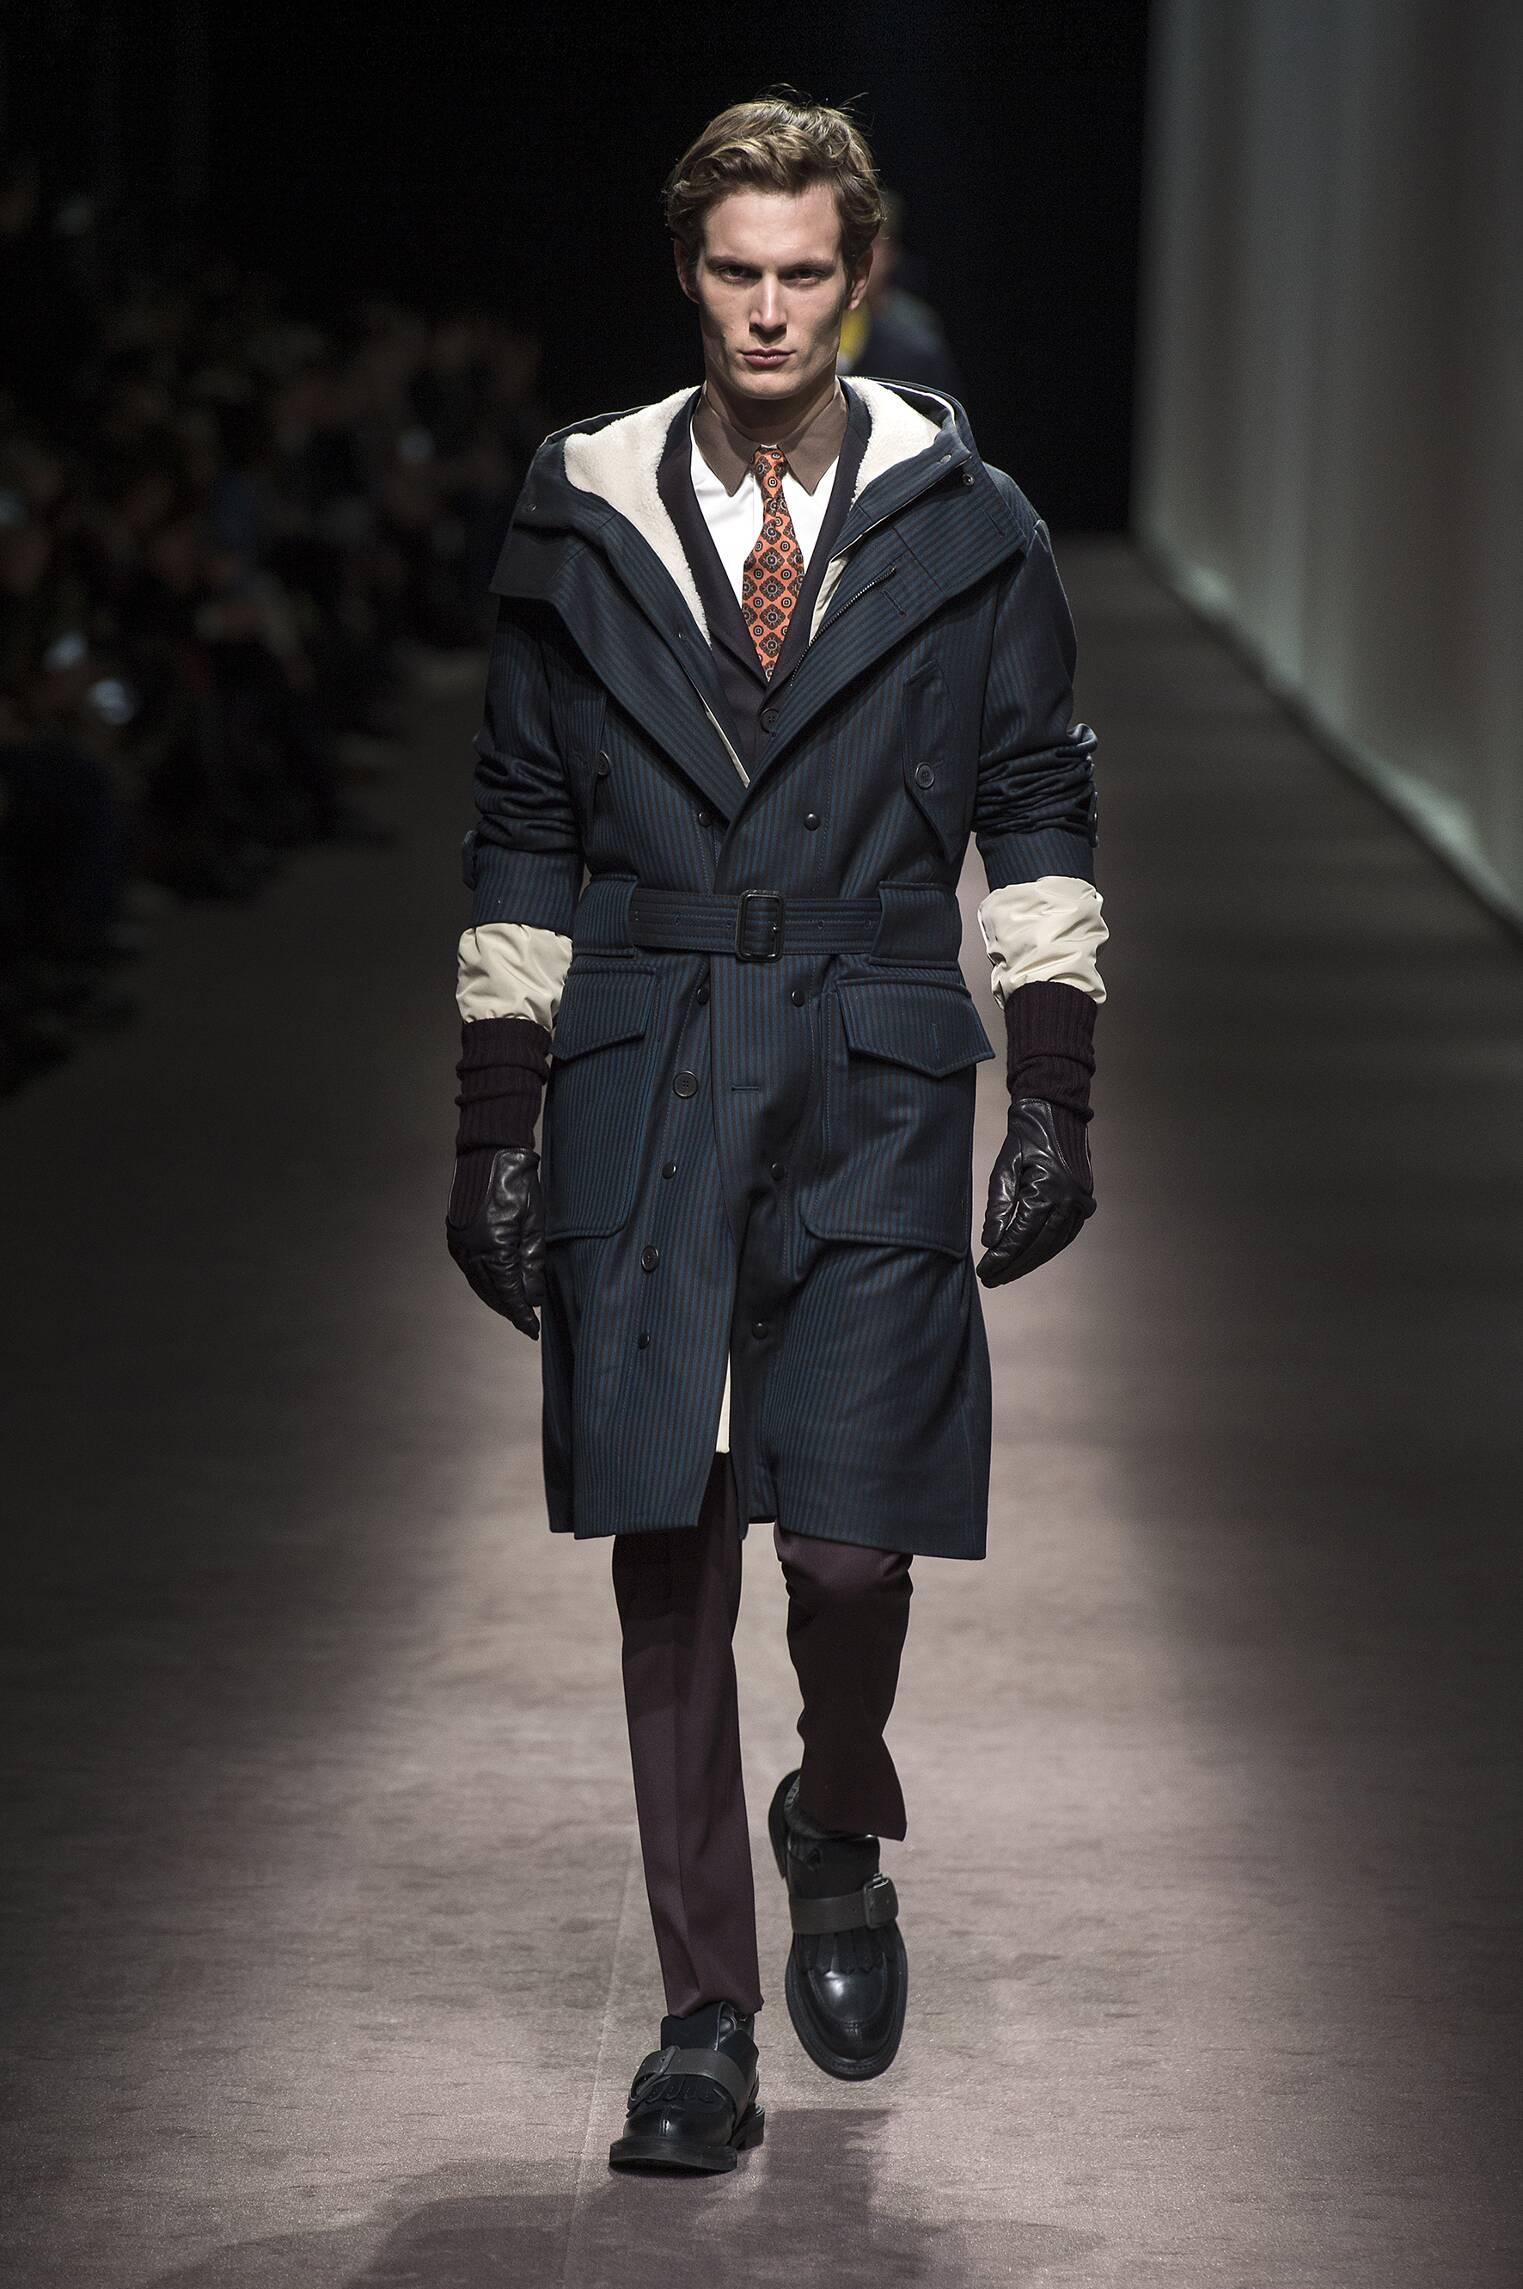 Catwalk Canali Man Fashion Show Winter 2016